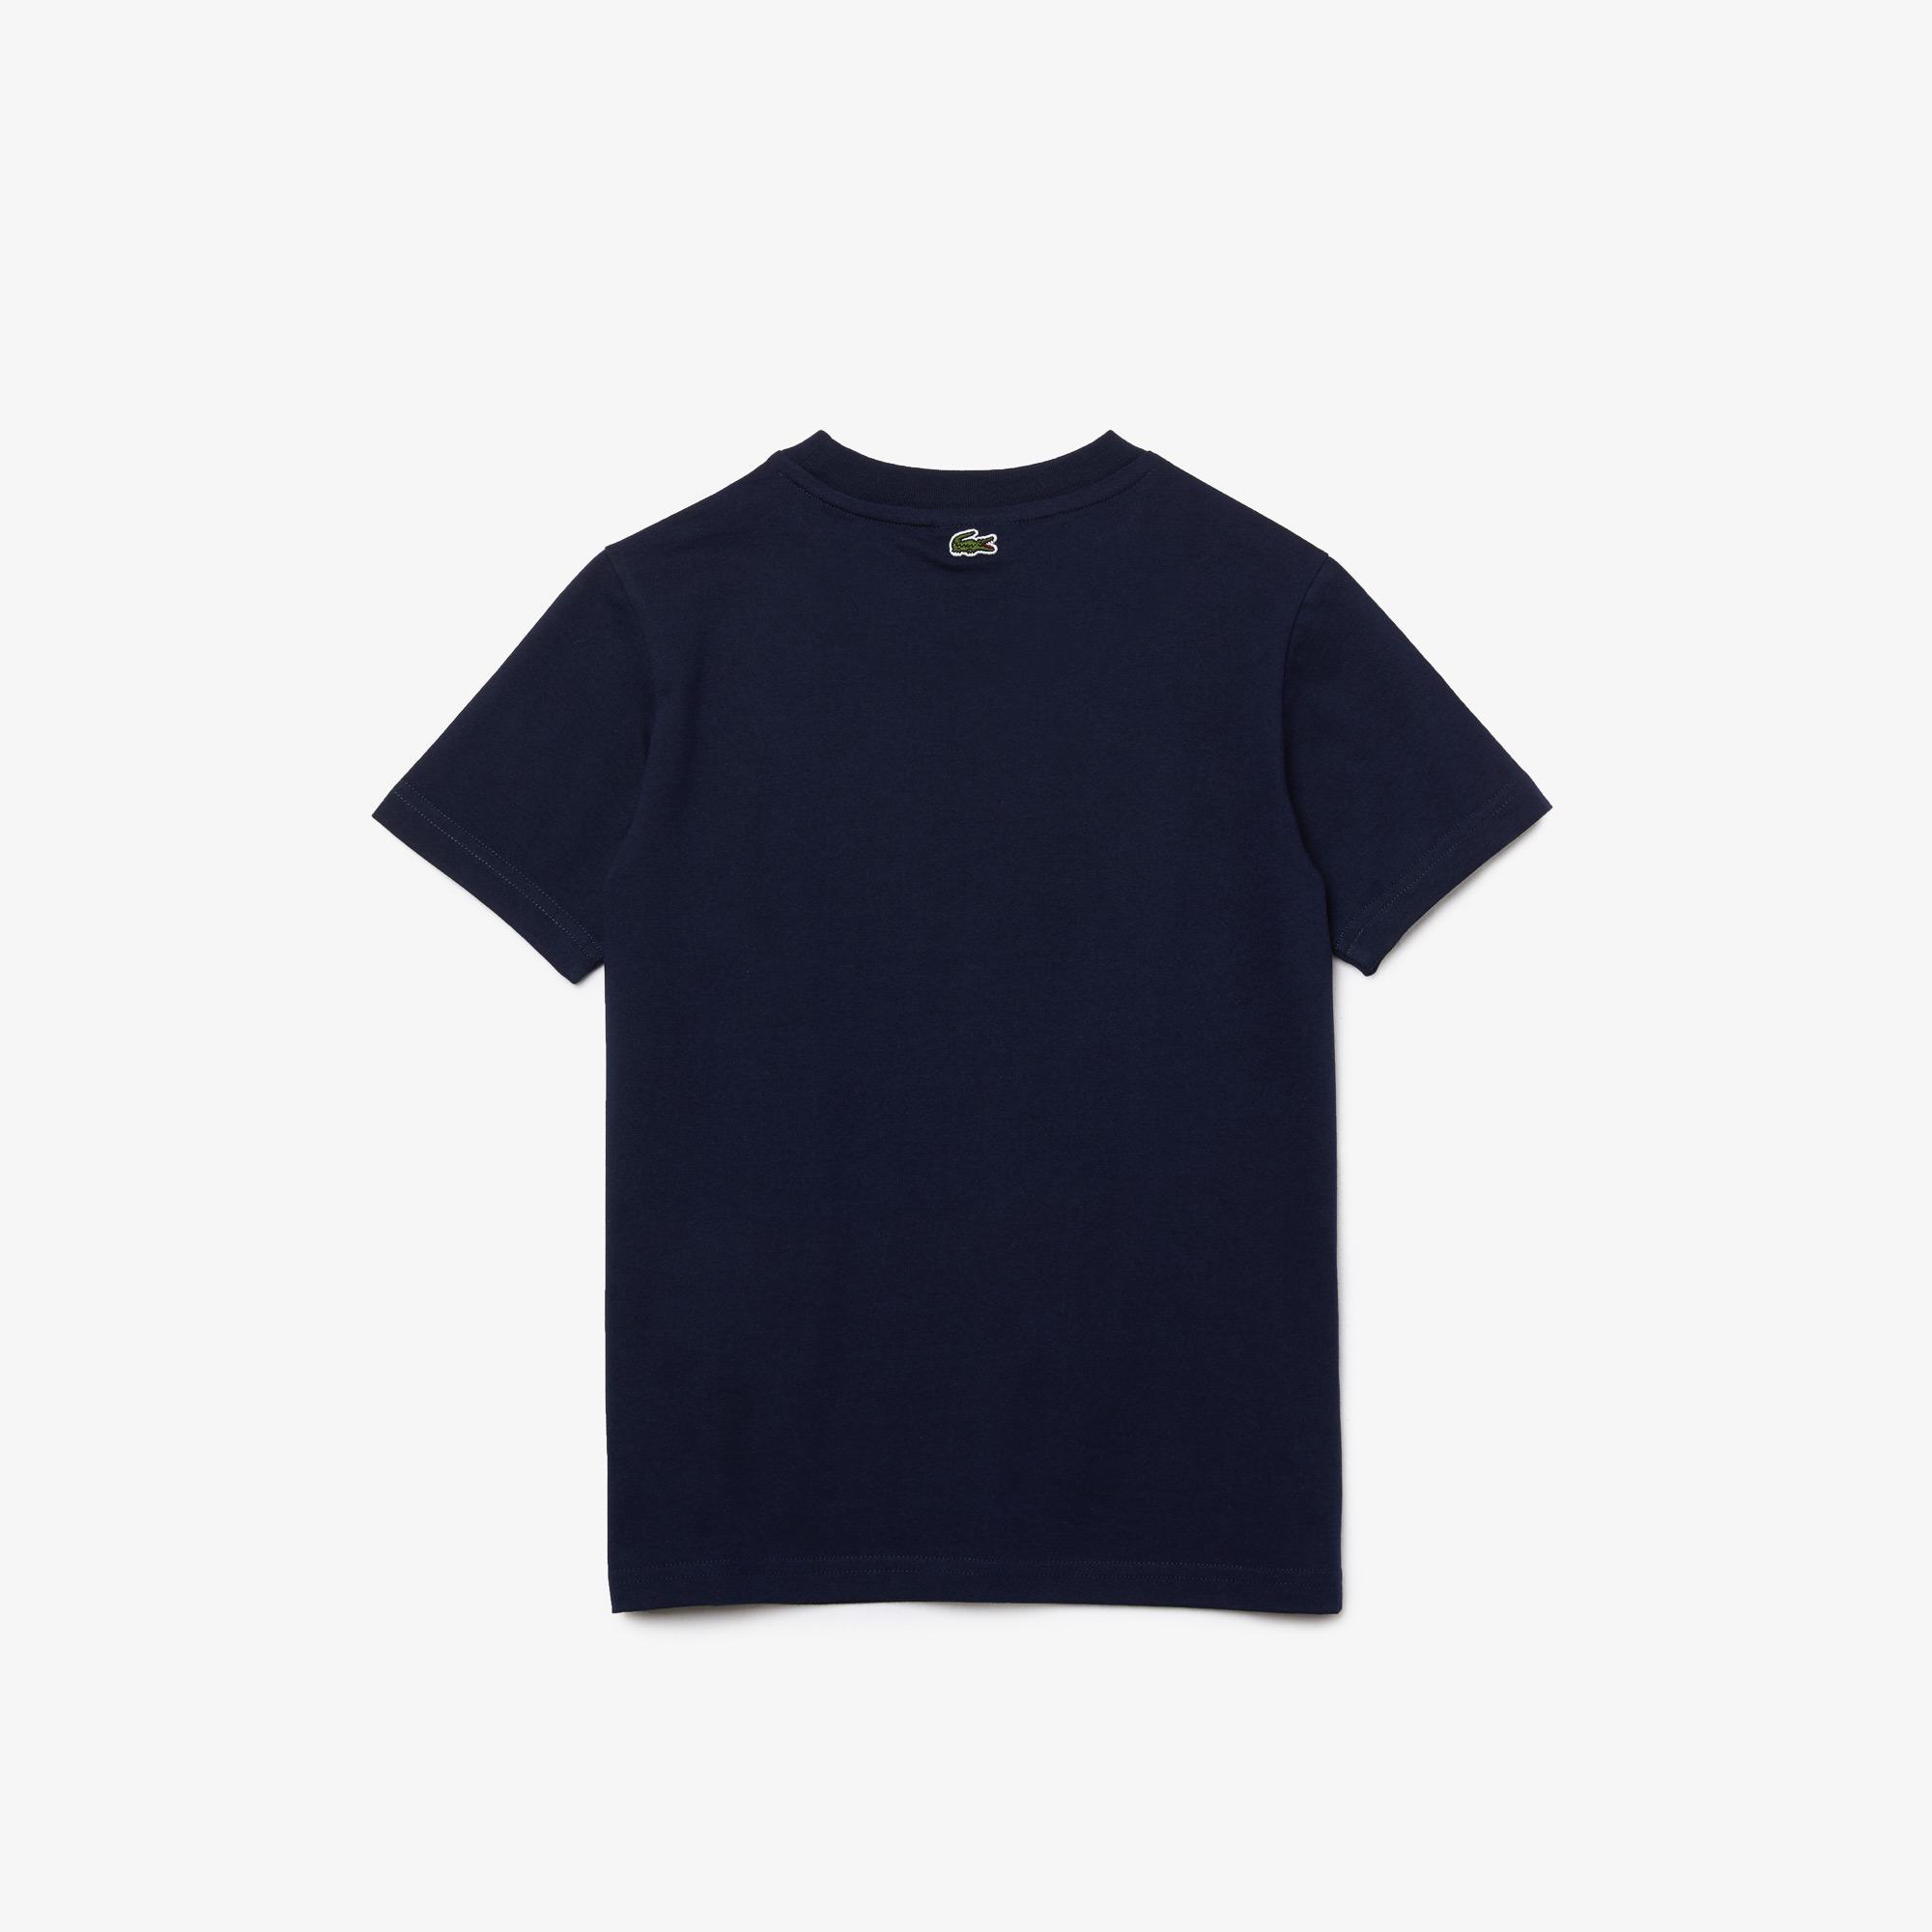 Lacoste Boys T-Shirt